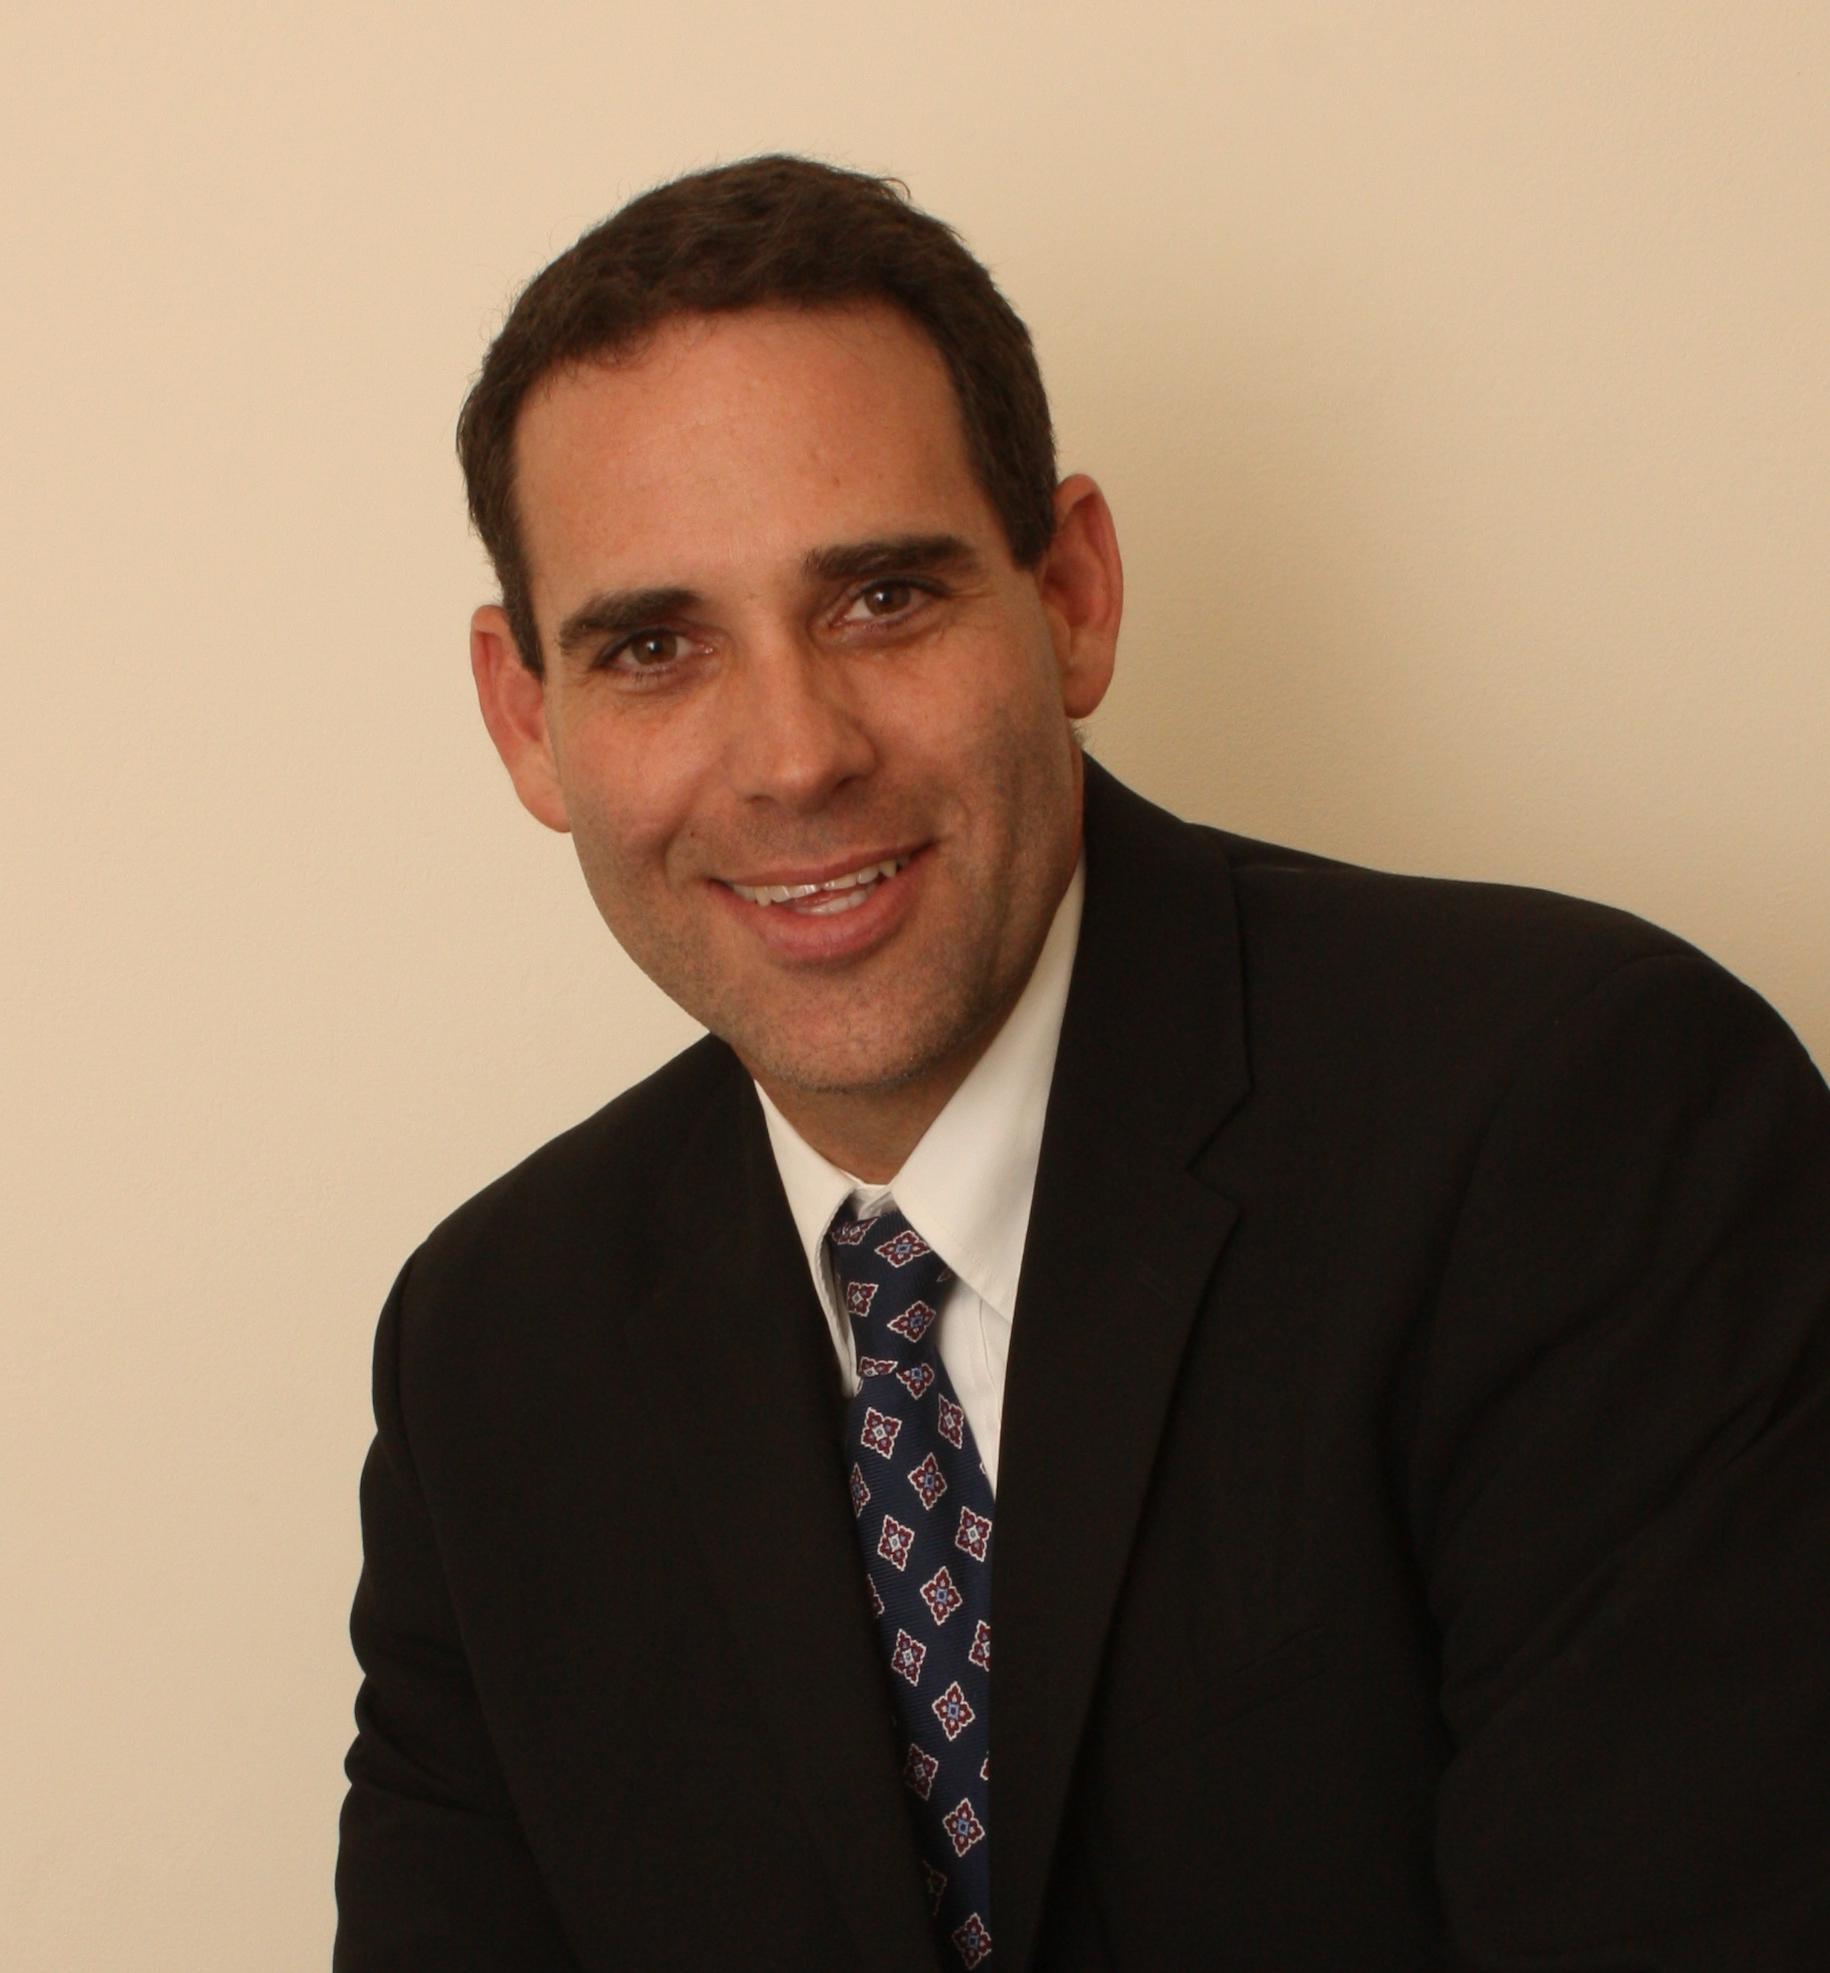 BOYD R. PHILLIPS  Your Financial Advisor